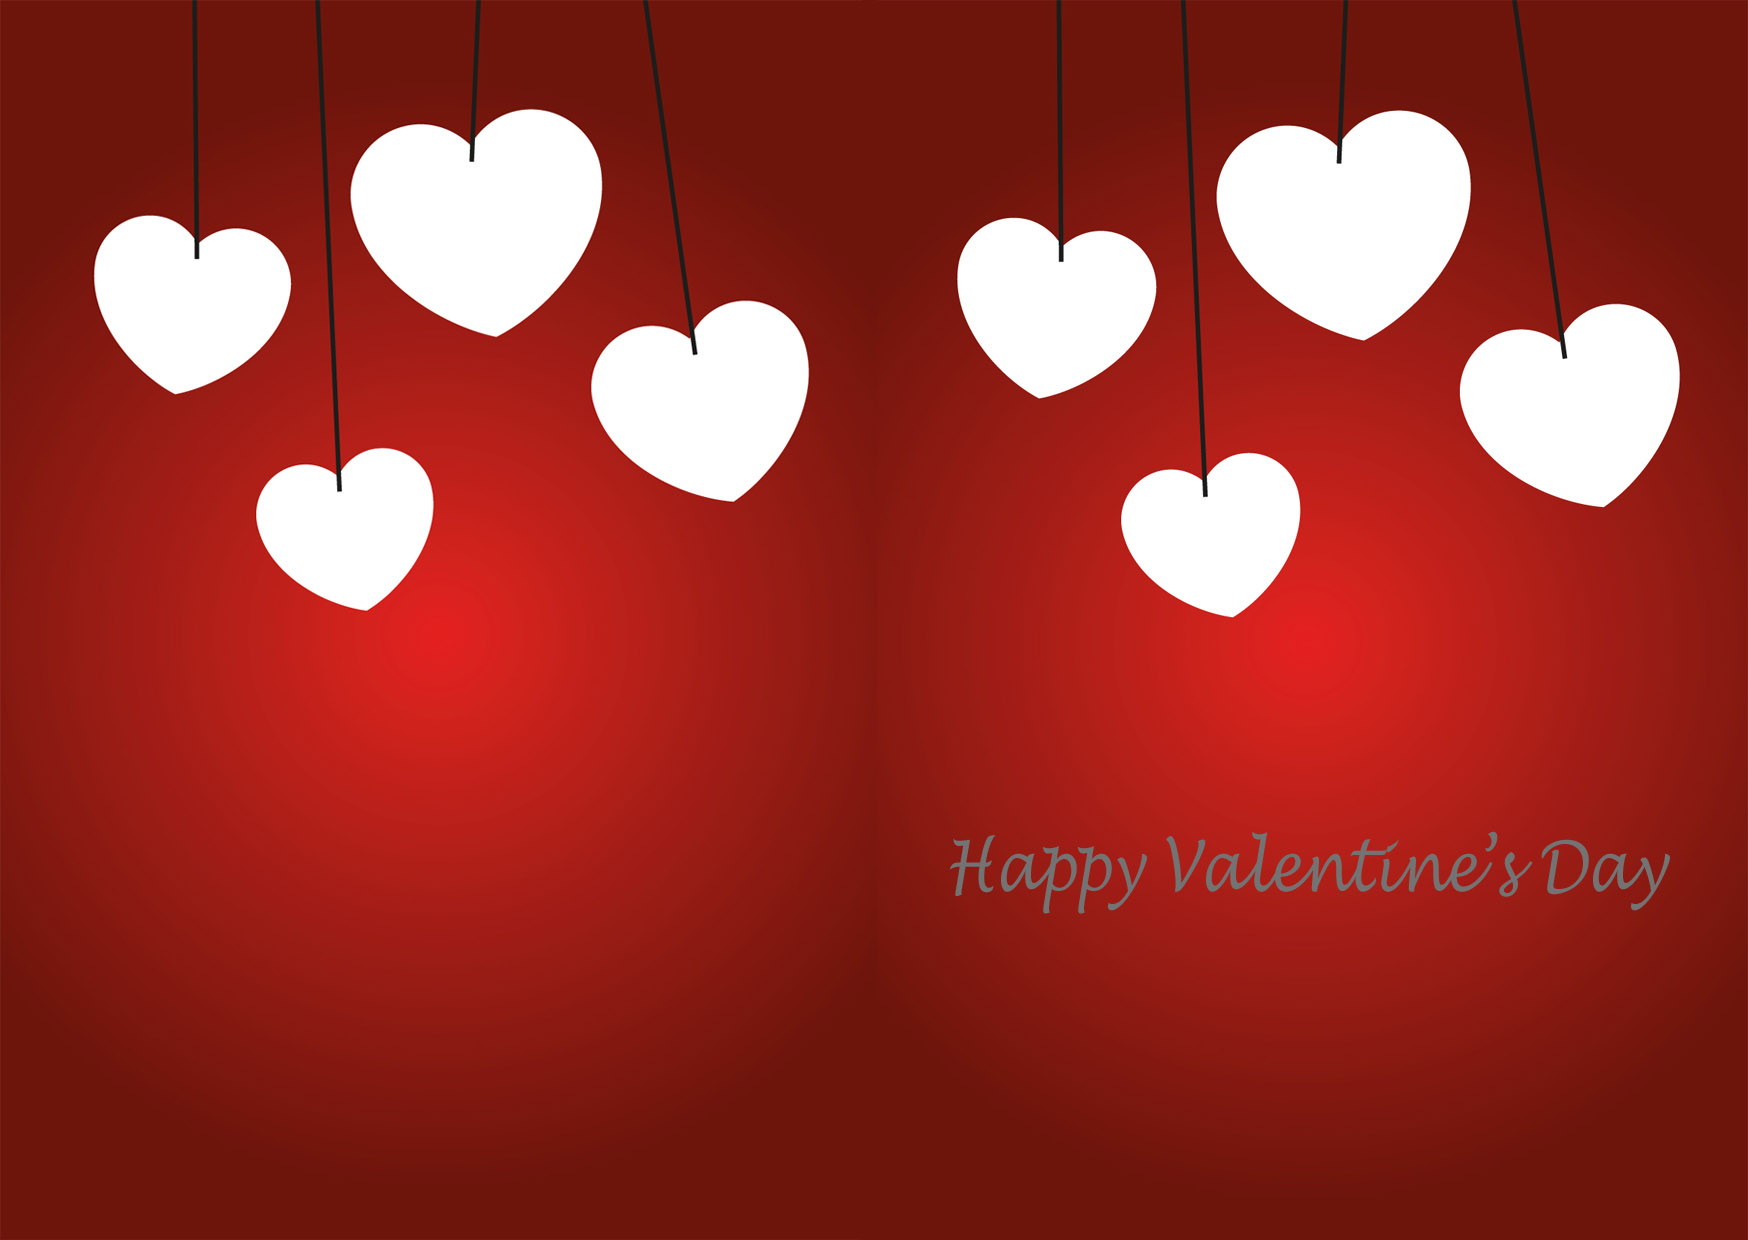 Valentine Cards 70 Background Wallpaper Hdlovewallcom